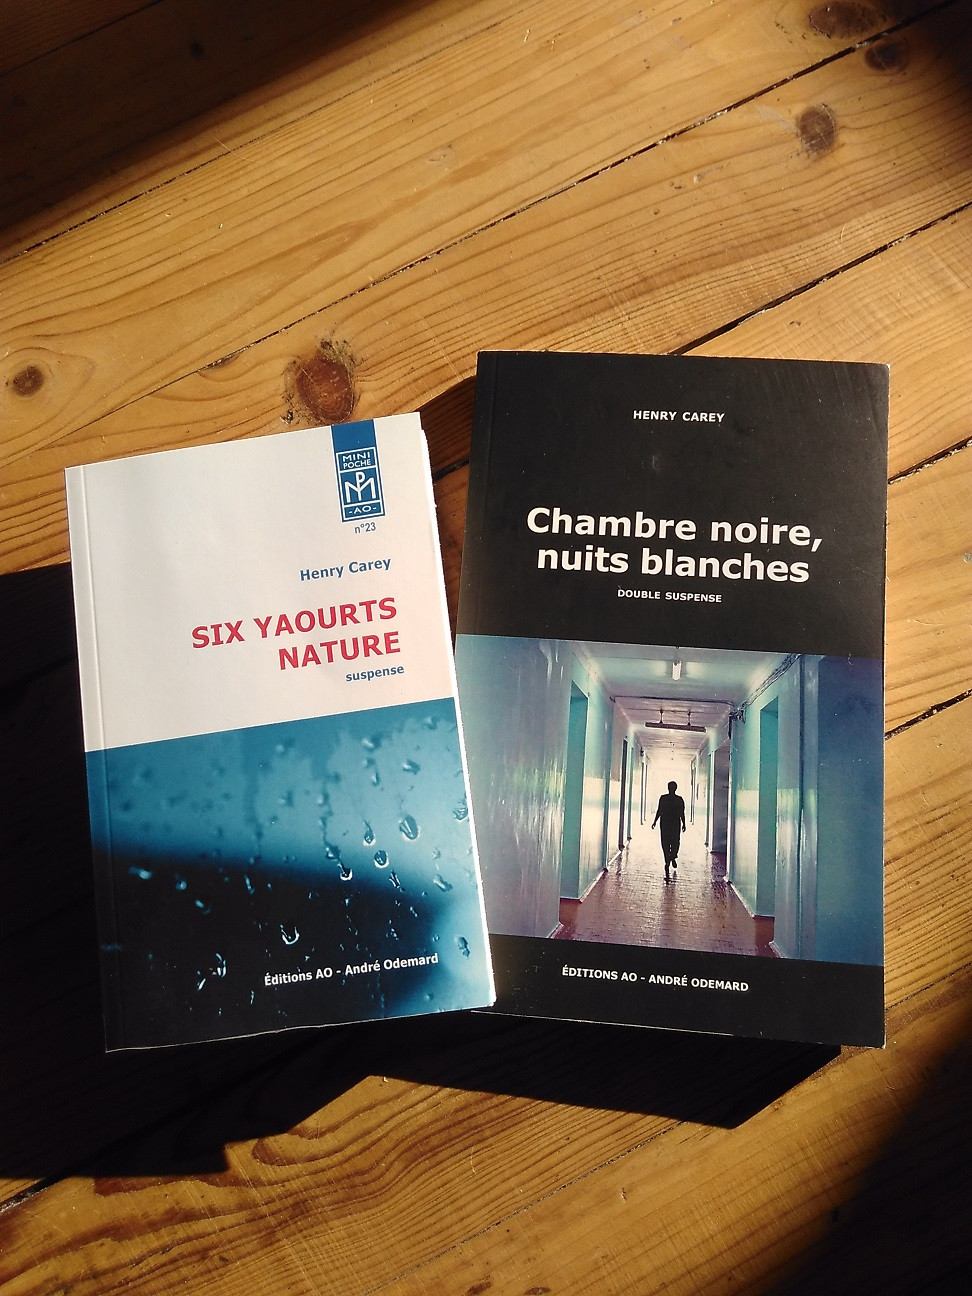 Six yaourts nature et Chambre noire, nuits blanches - roman d'Henry Carey